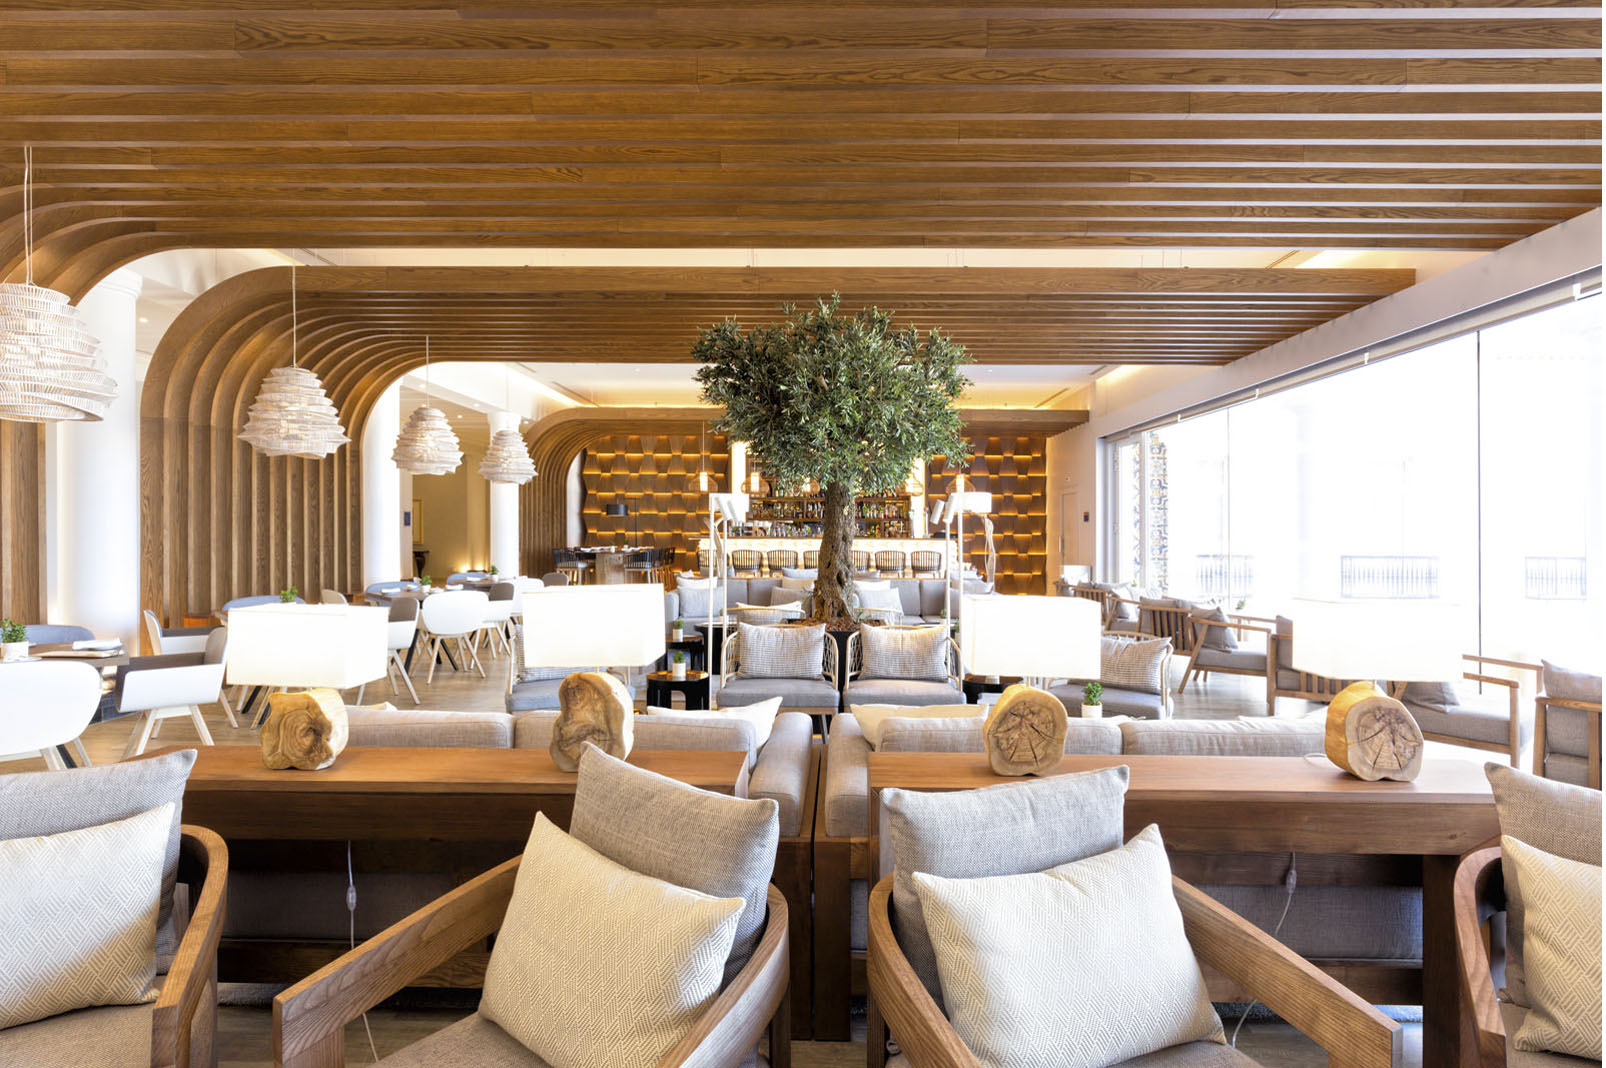 HotelMarriot_20170309_0063 copy.jpg